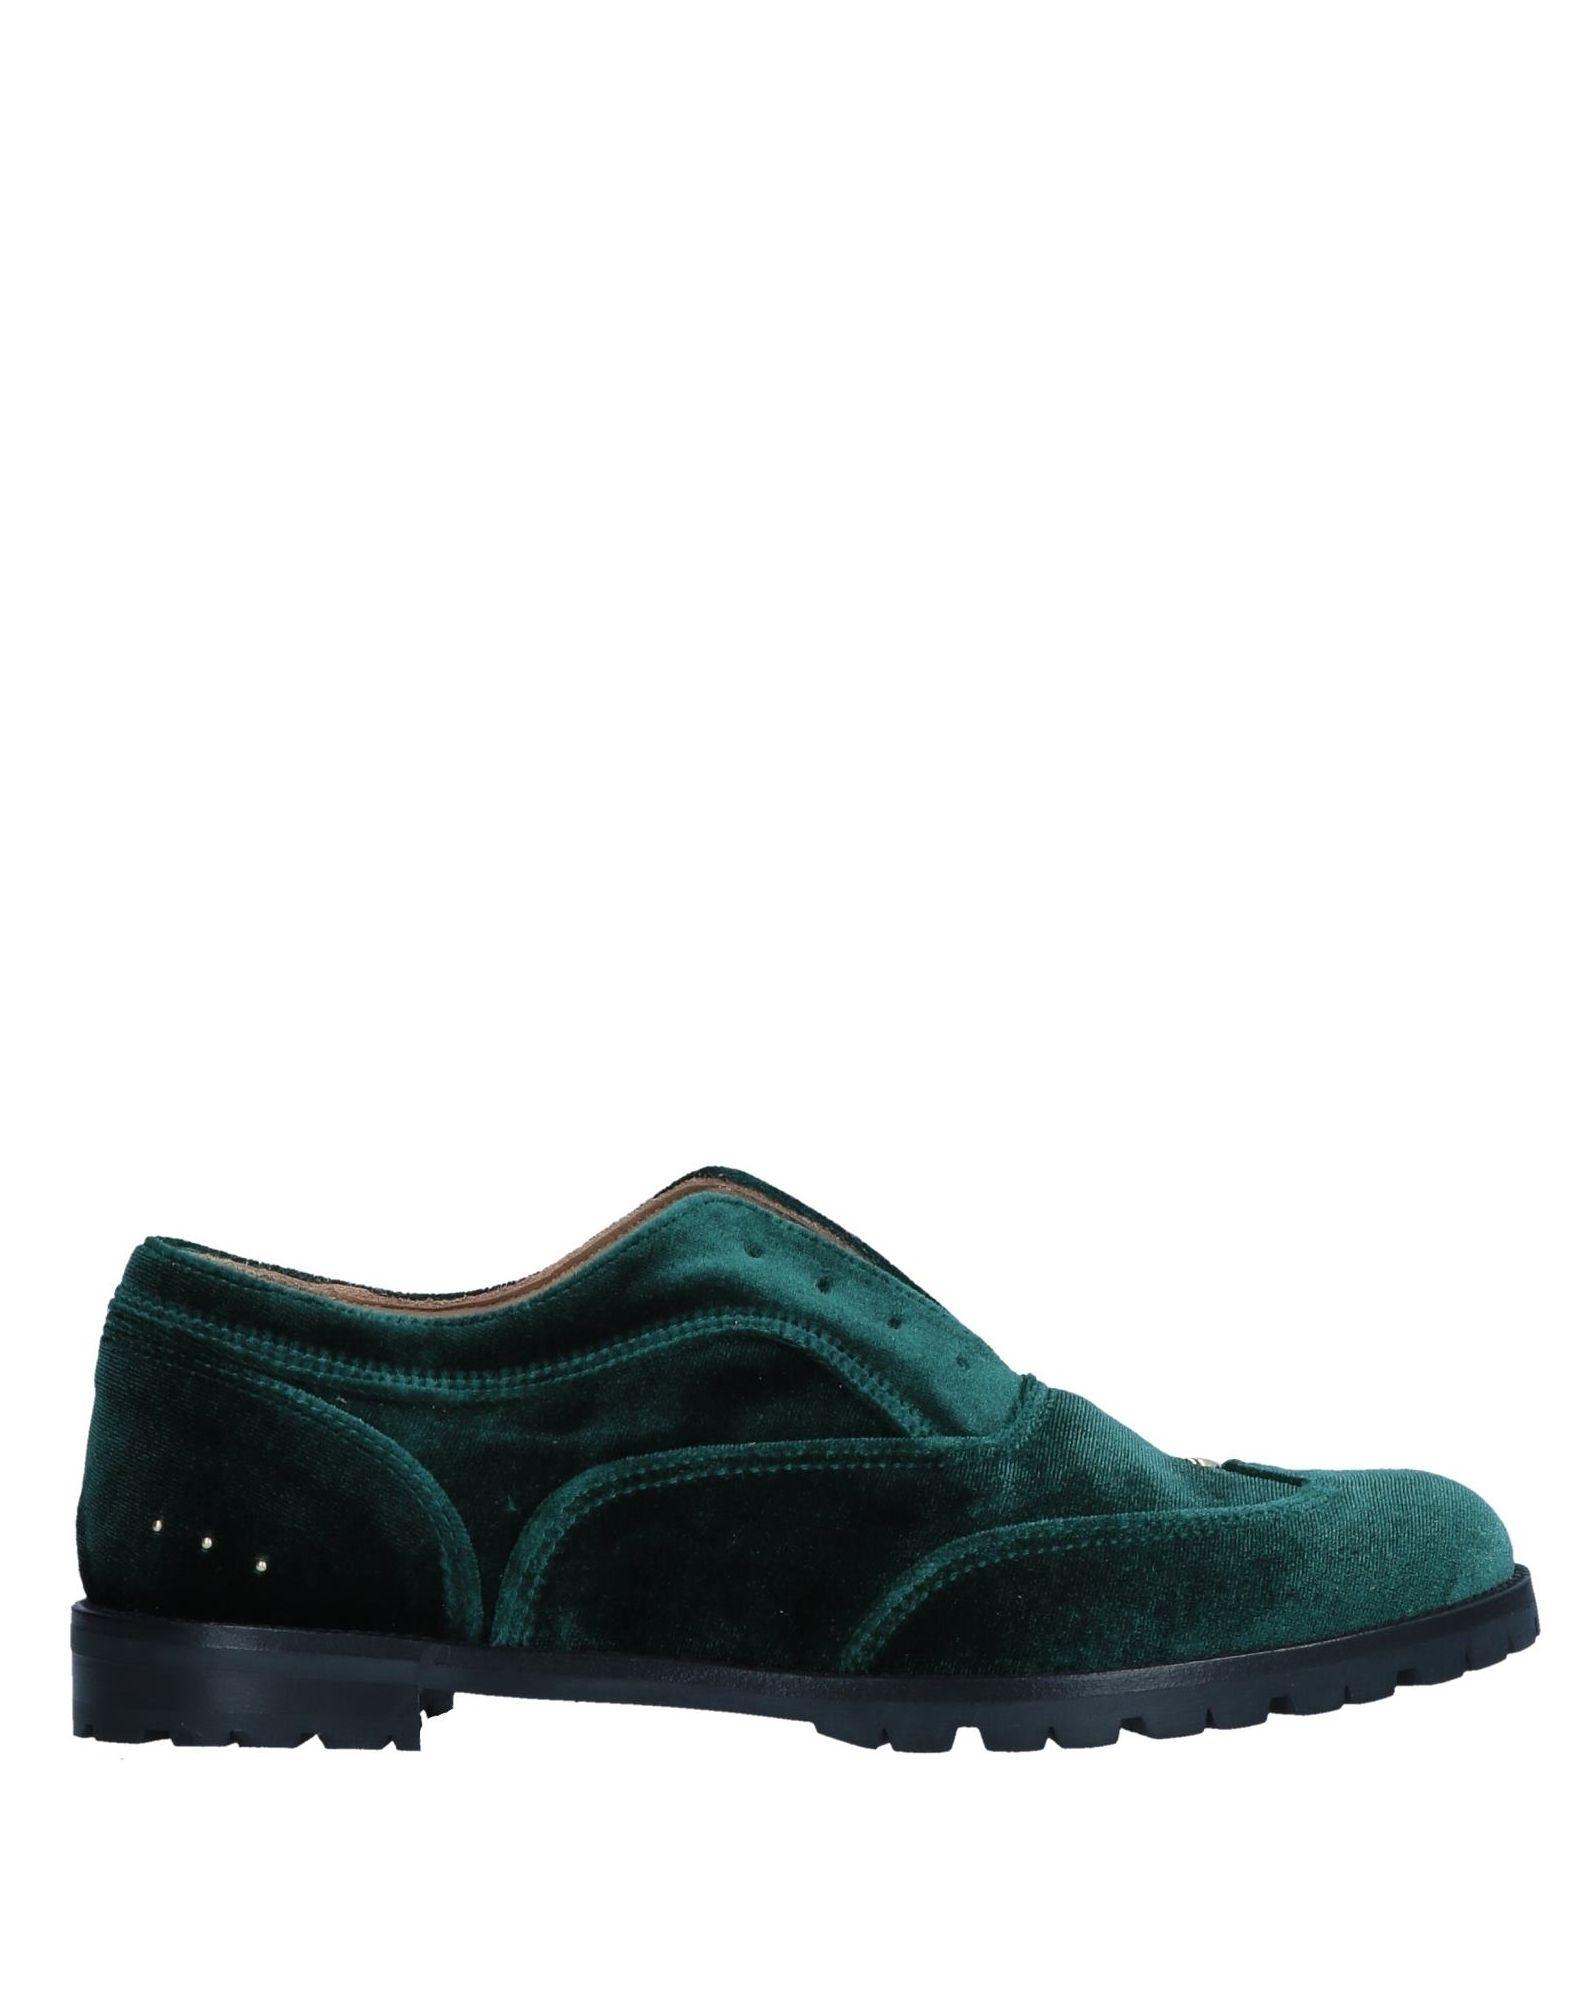 L'f Shoes Mokassins Damen Schuhe  11545733JPGut aussehende strapazierfähige Schuhe Damen e5f79f